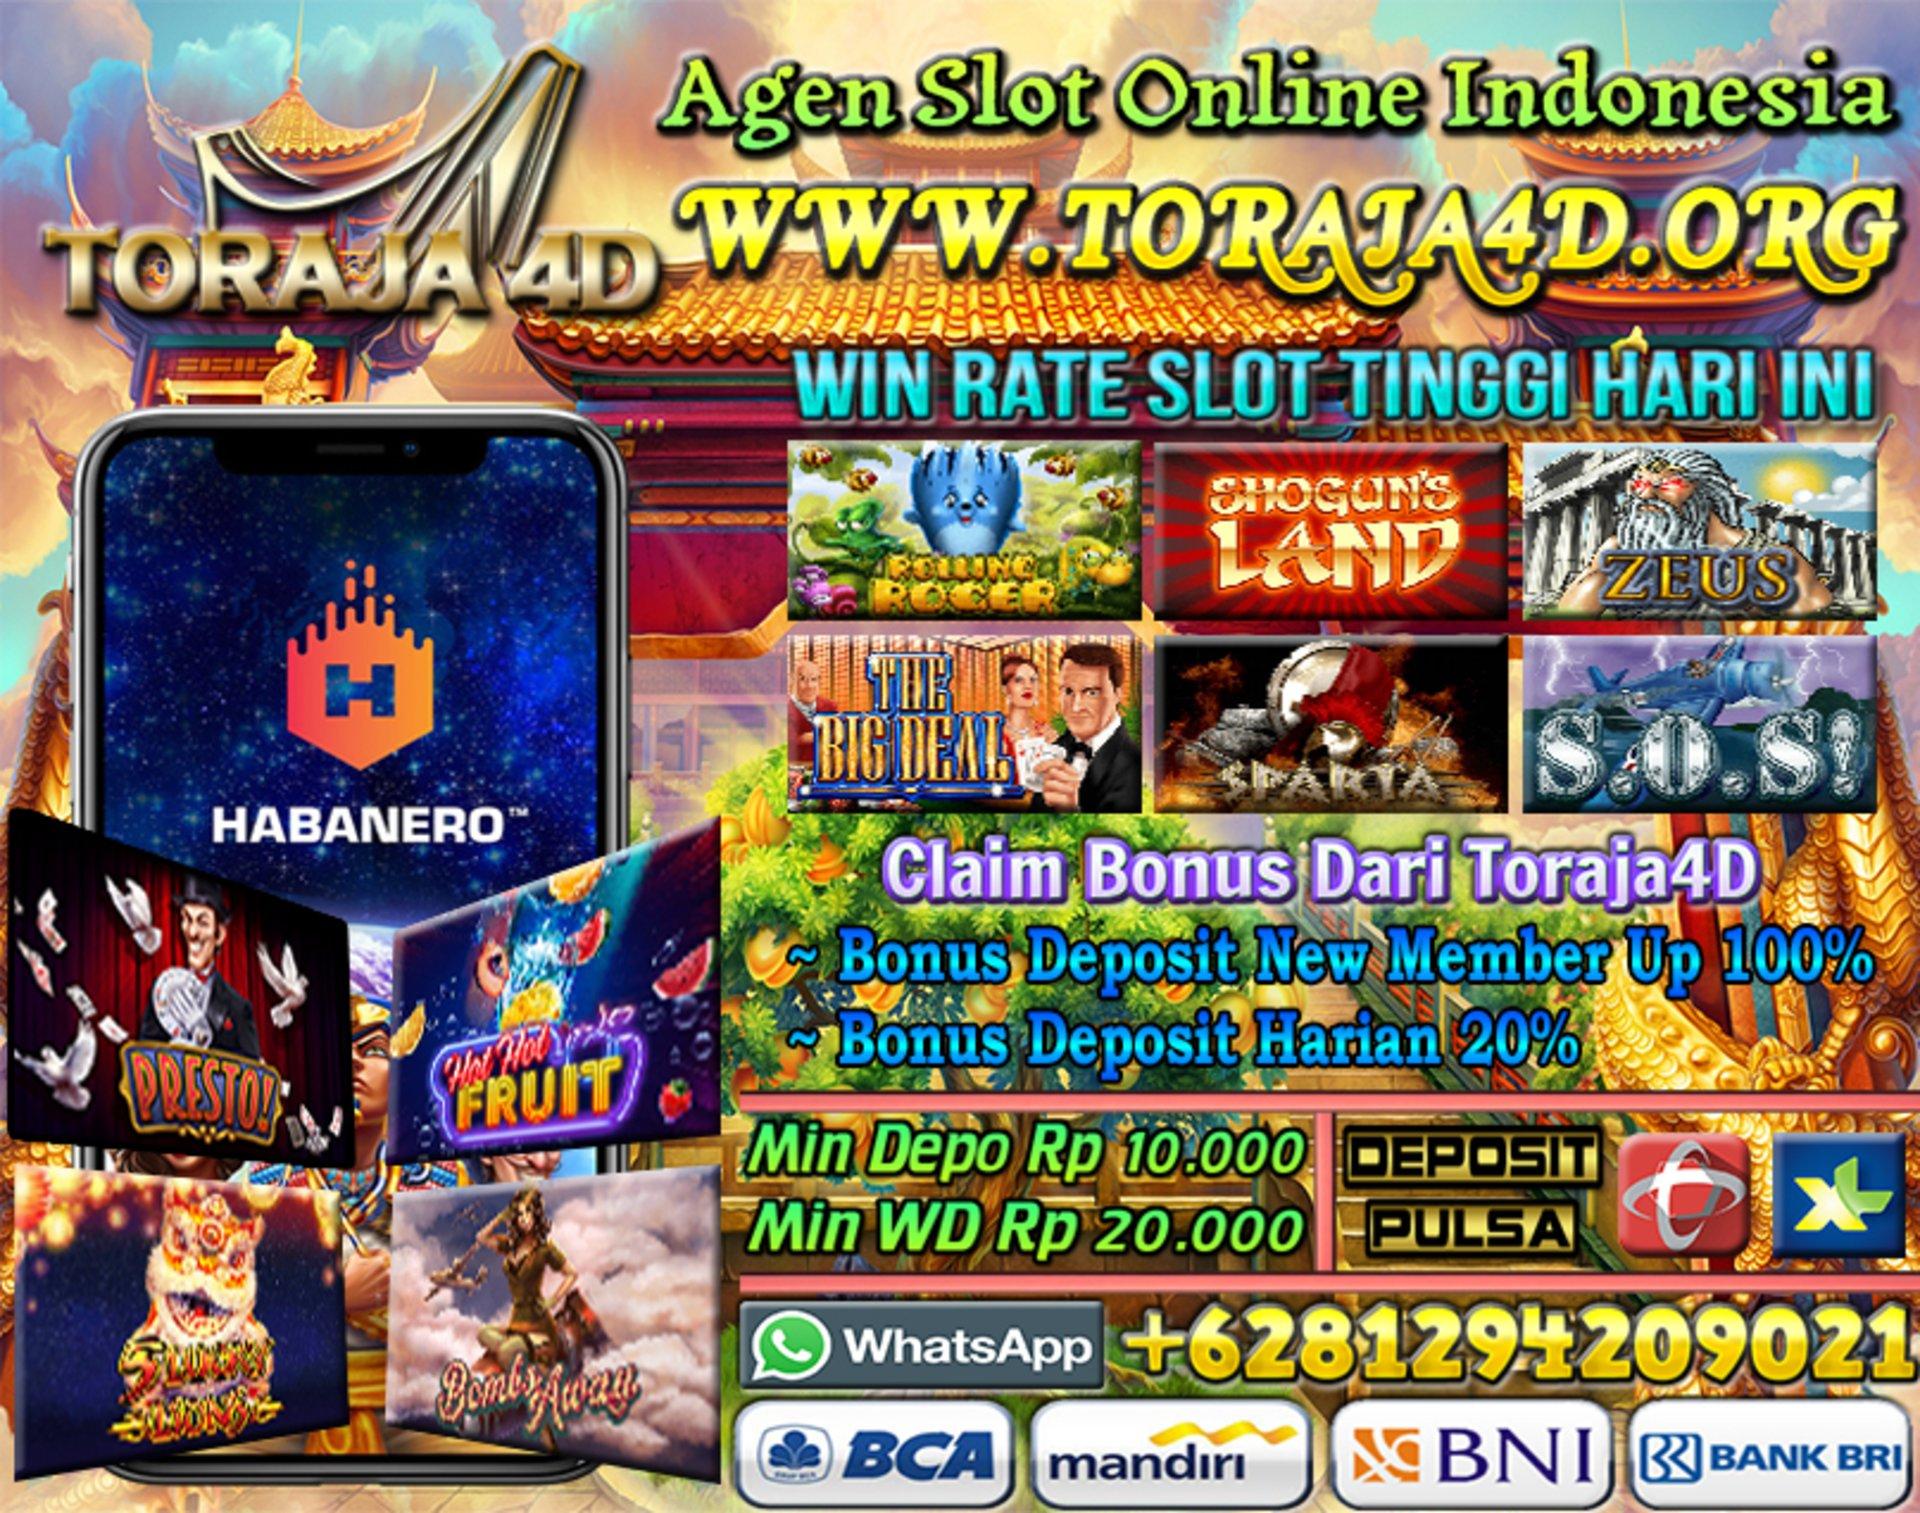 Toraja4d Agen Slot Online Indonesia Tangkas Online Slot Games Bacarrat Toraja4d